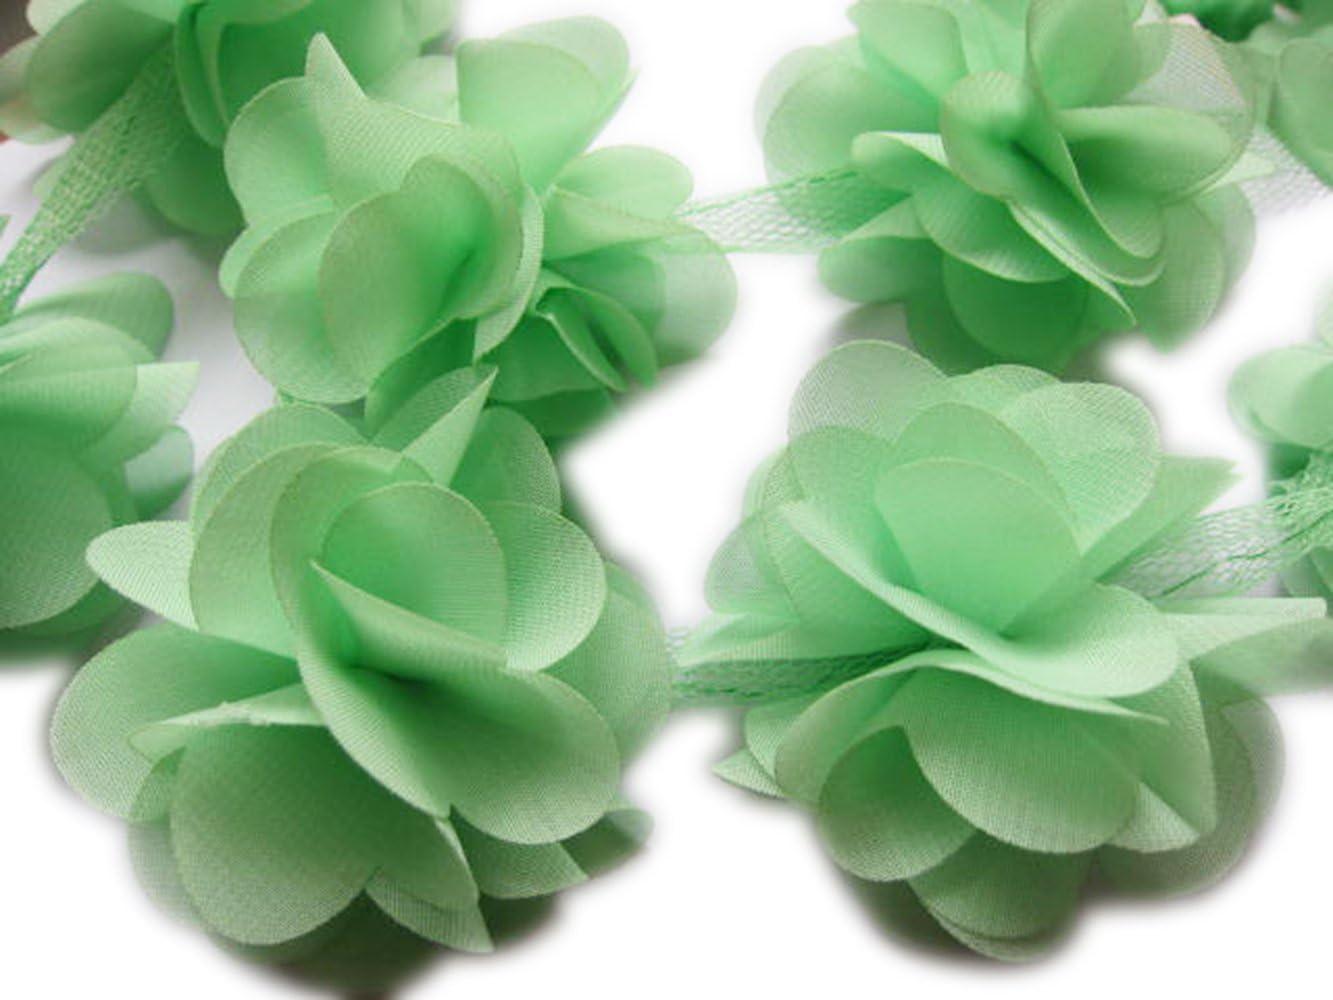 Grey YYCRAFT 5 Yards 2.5 3D Chiffon Flower Lace Trims Bridal Bouquets Cluster Flower DIY Sewing